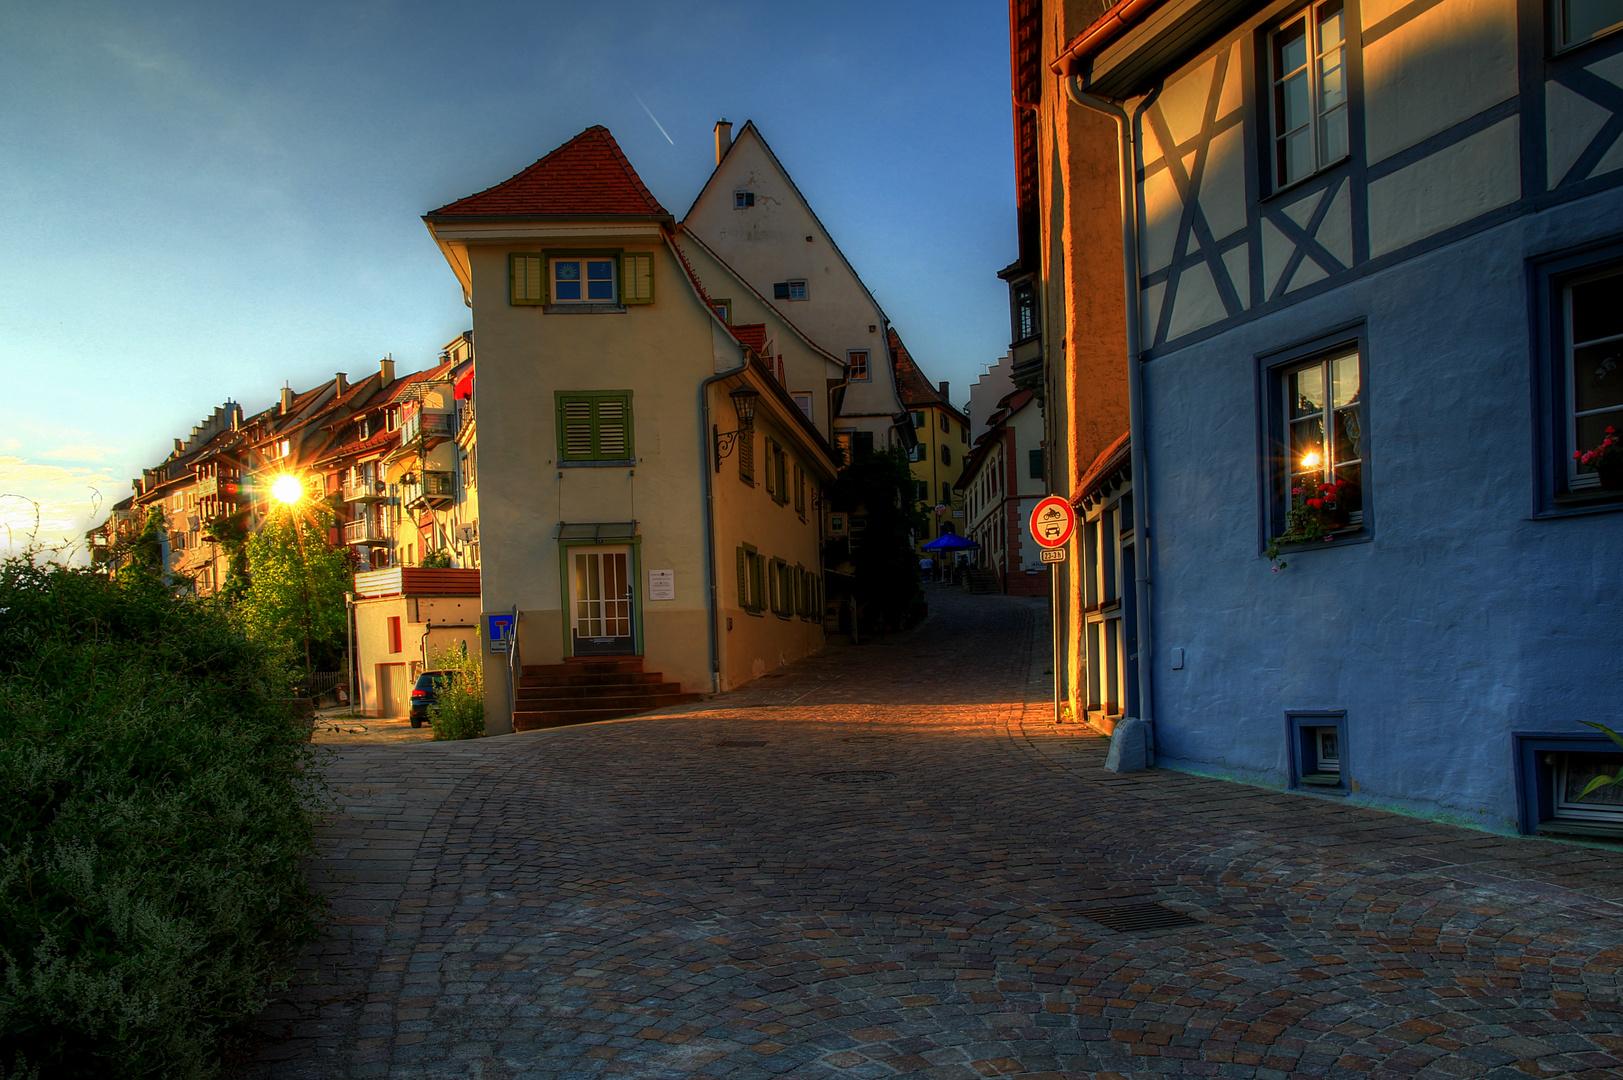 Sonnenreflexionen in der Altstadt